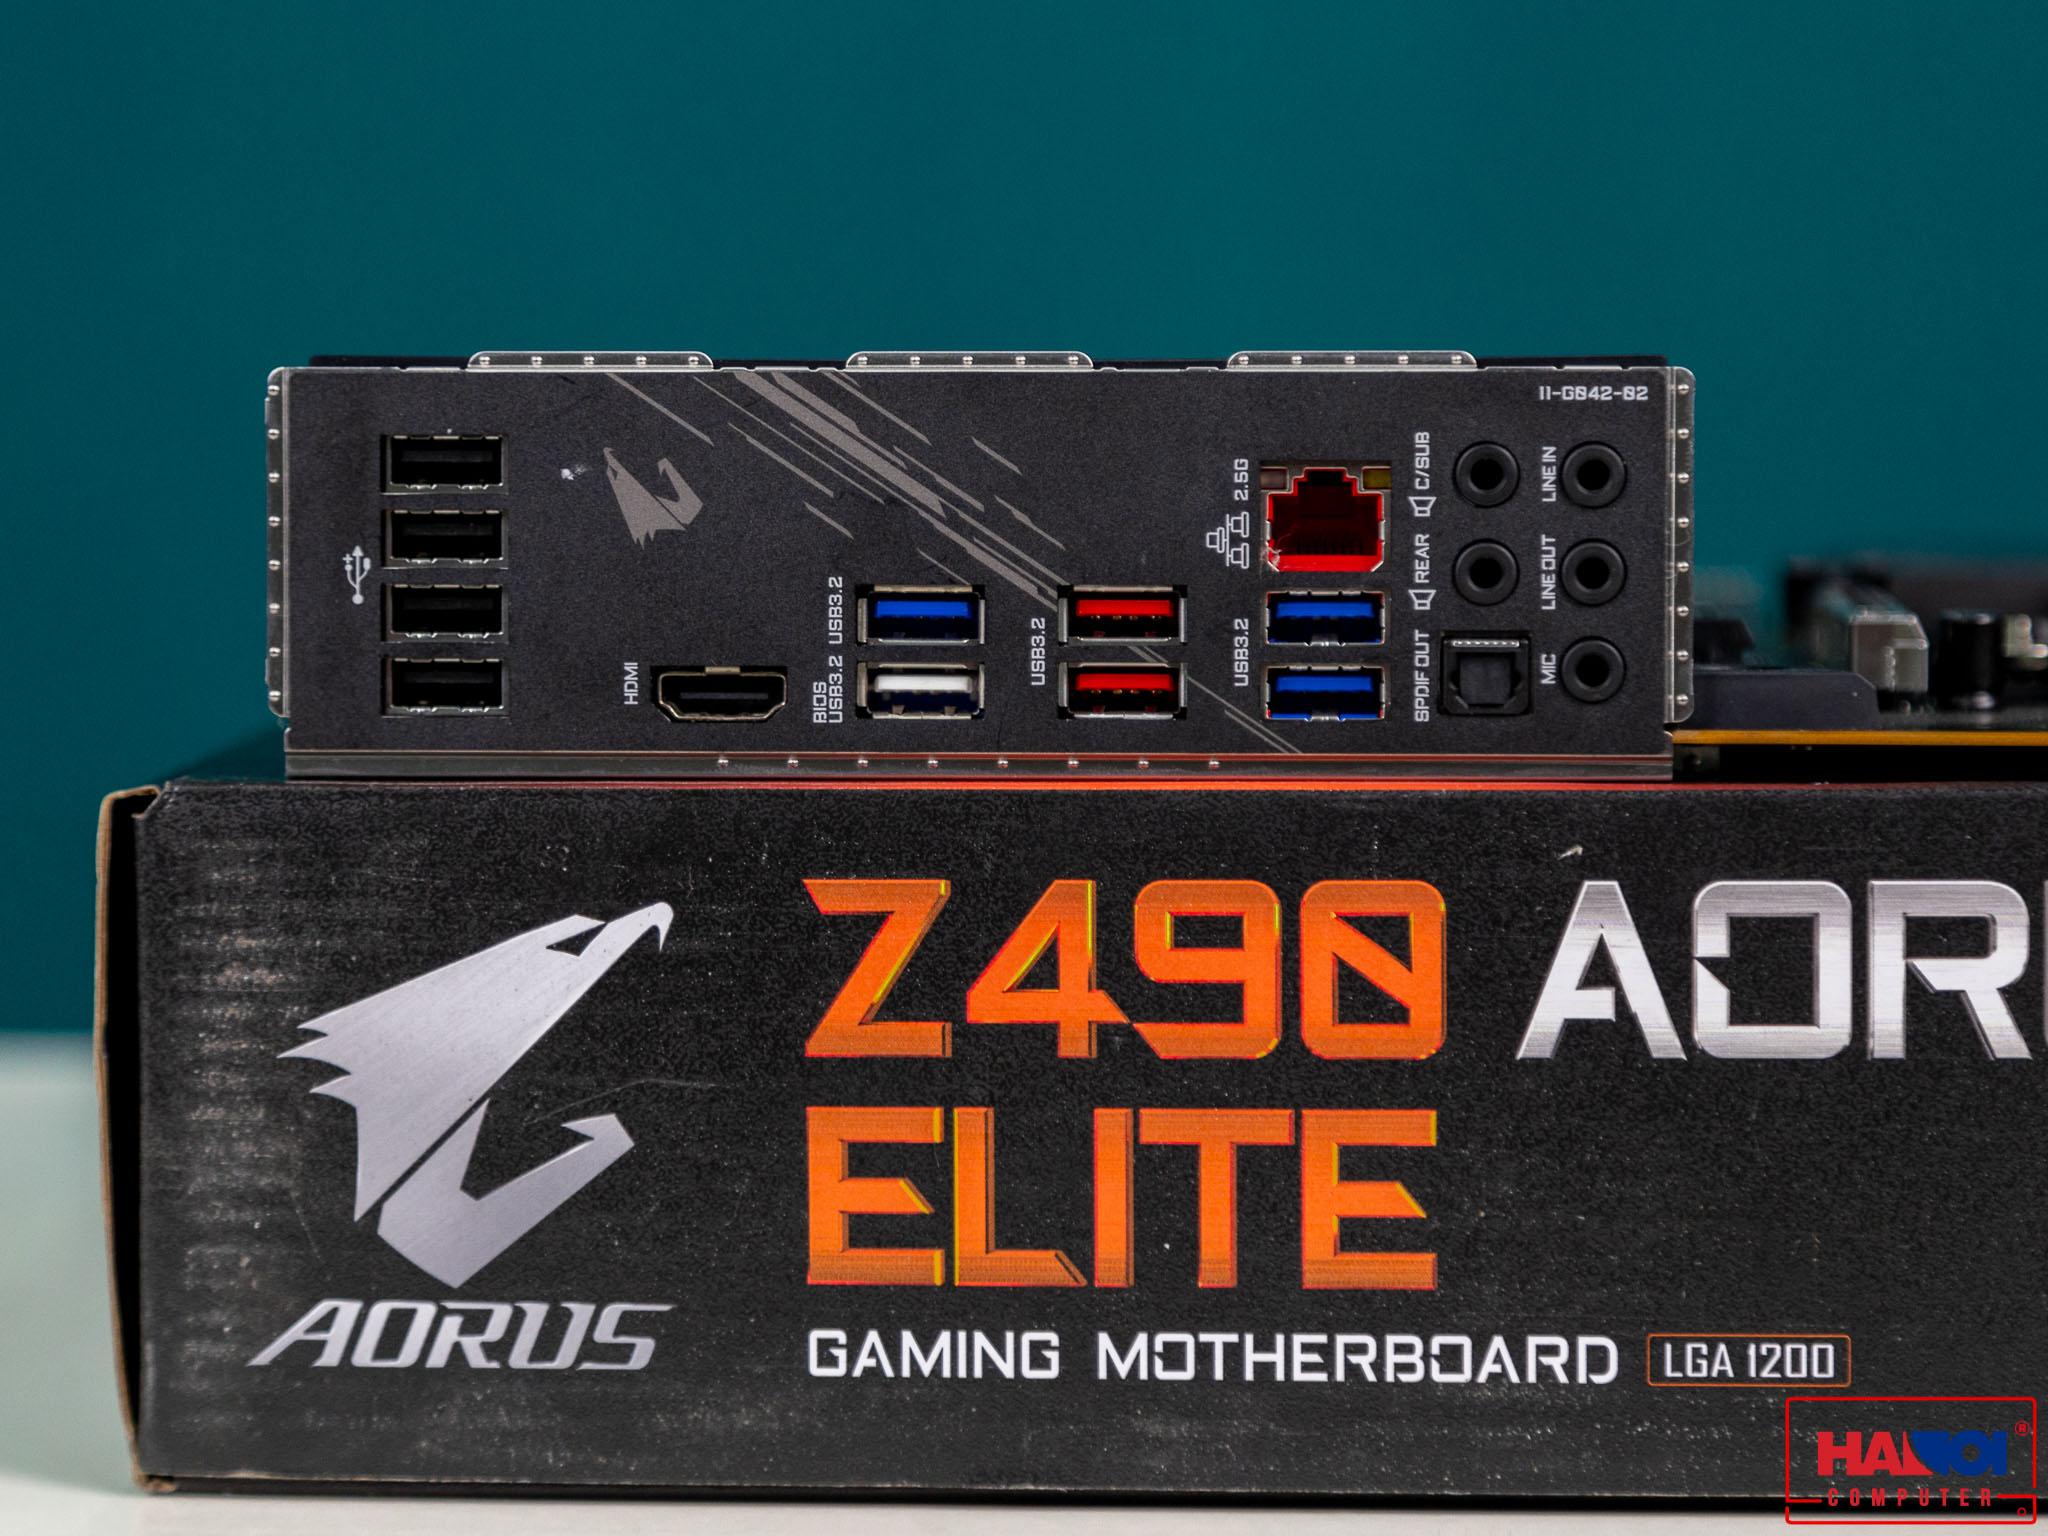 Mainboard GIGABYTE Z490 AORUS ELITE (Intel Z490, Socket 1200, ATX, 4 khe RAM DDR4)